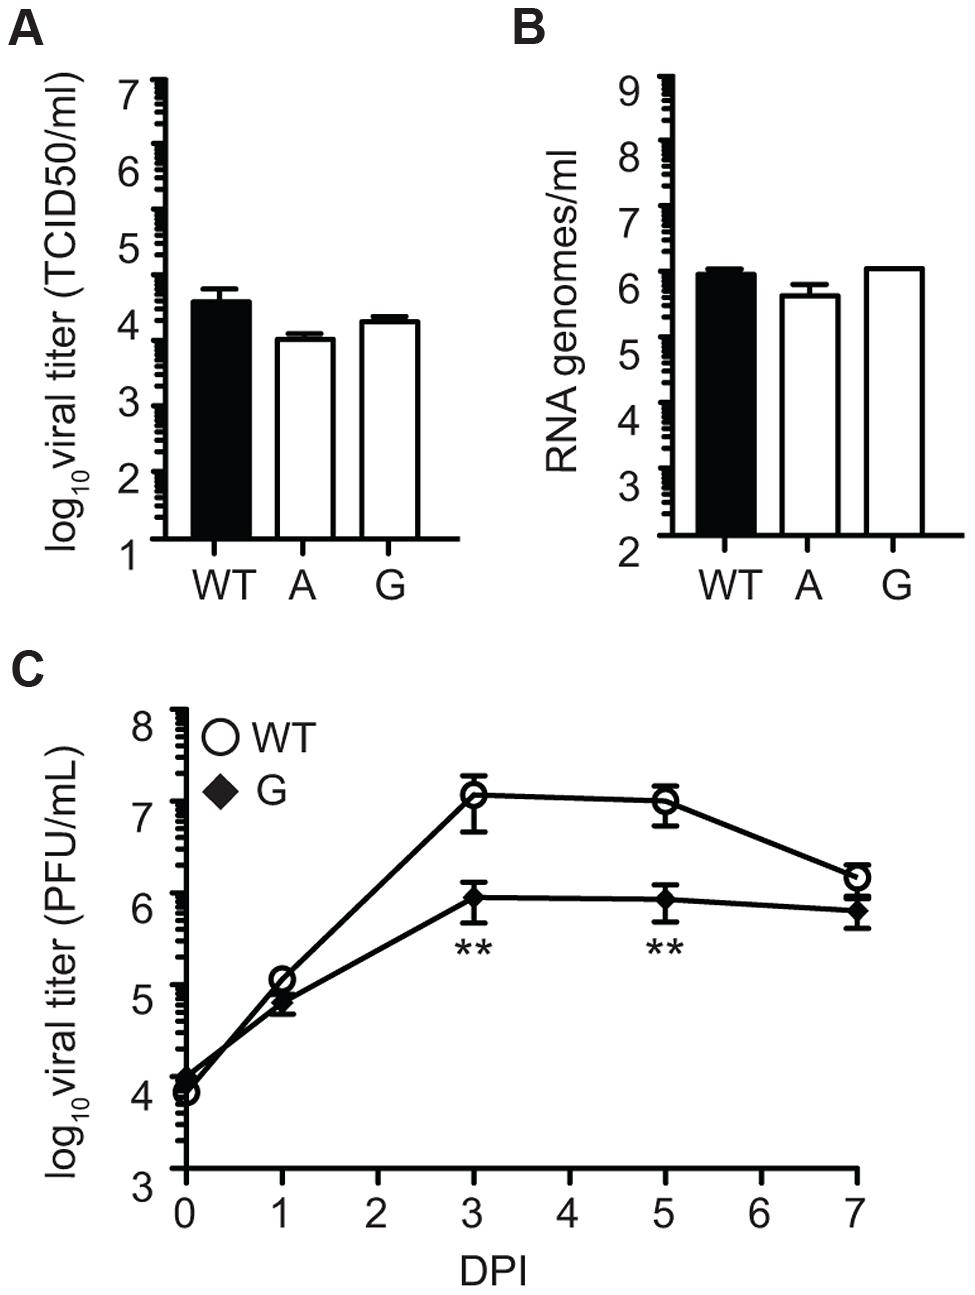 SINV mutator 482G is attenuated in fruit flies.